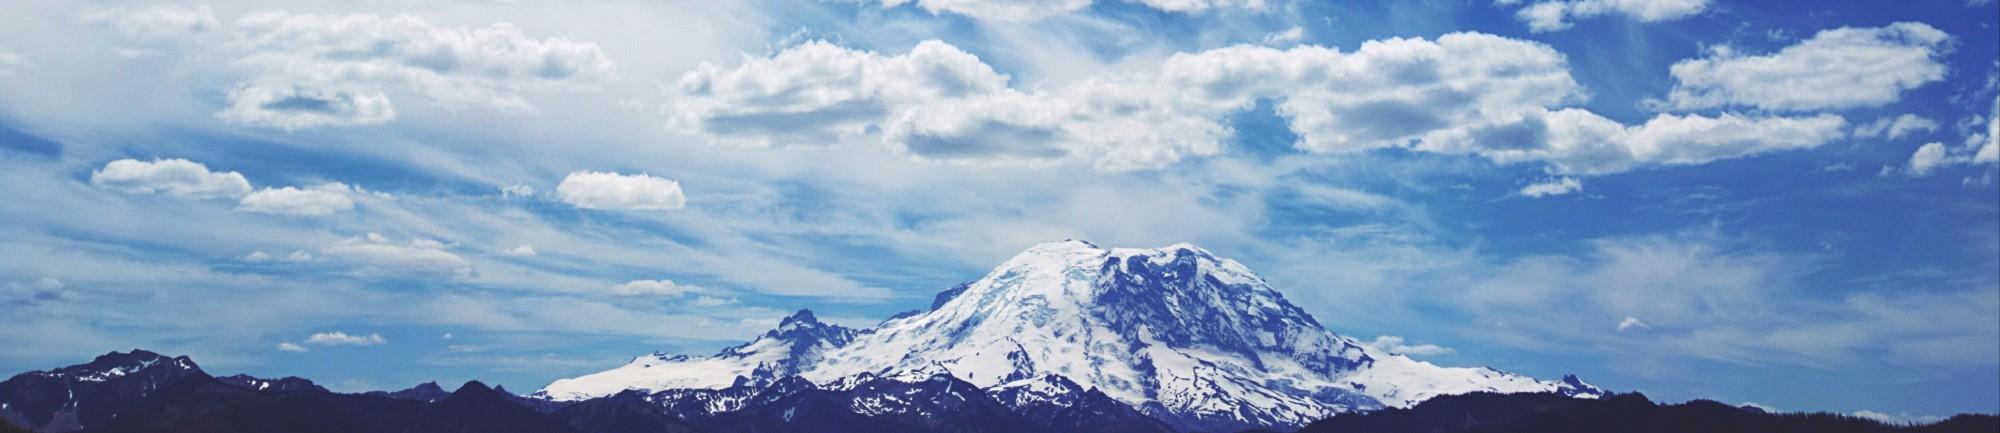 Mount Rainier - Pacific North Wanderers.jpg